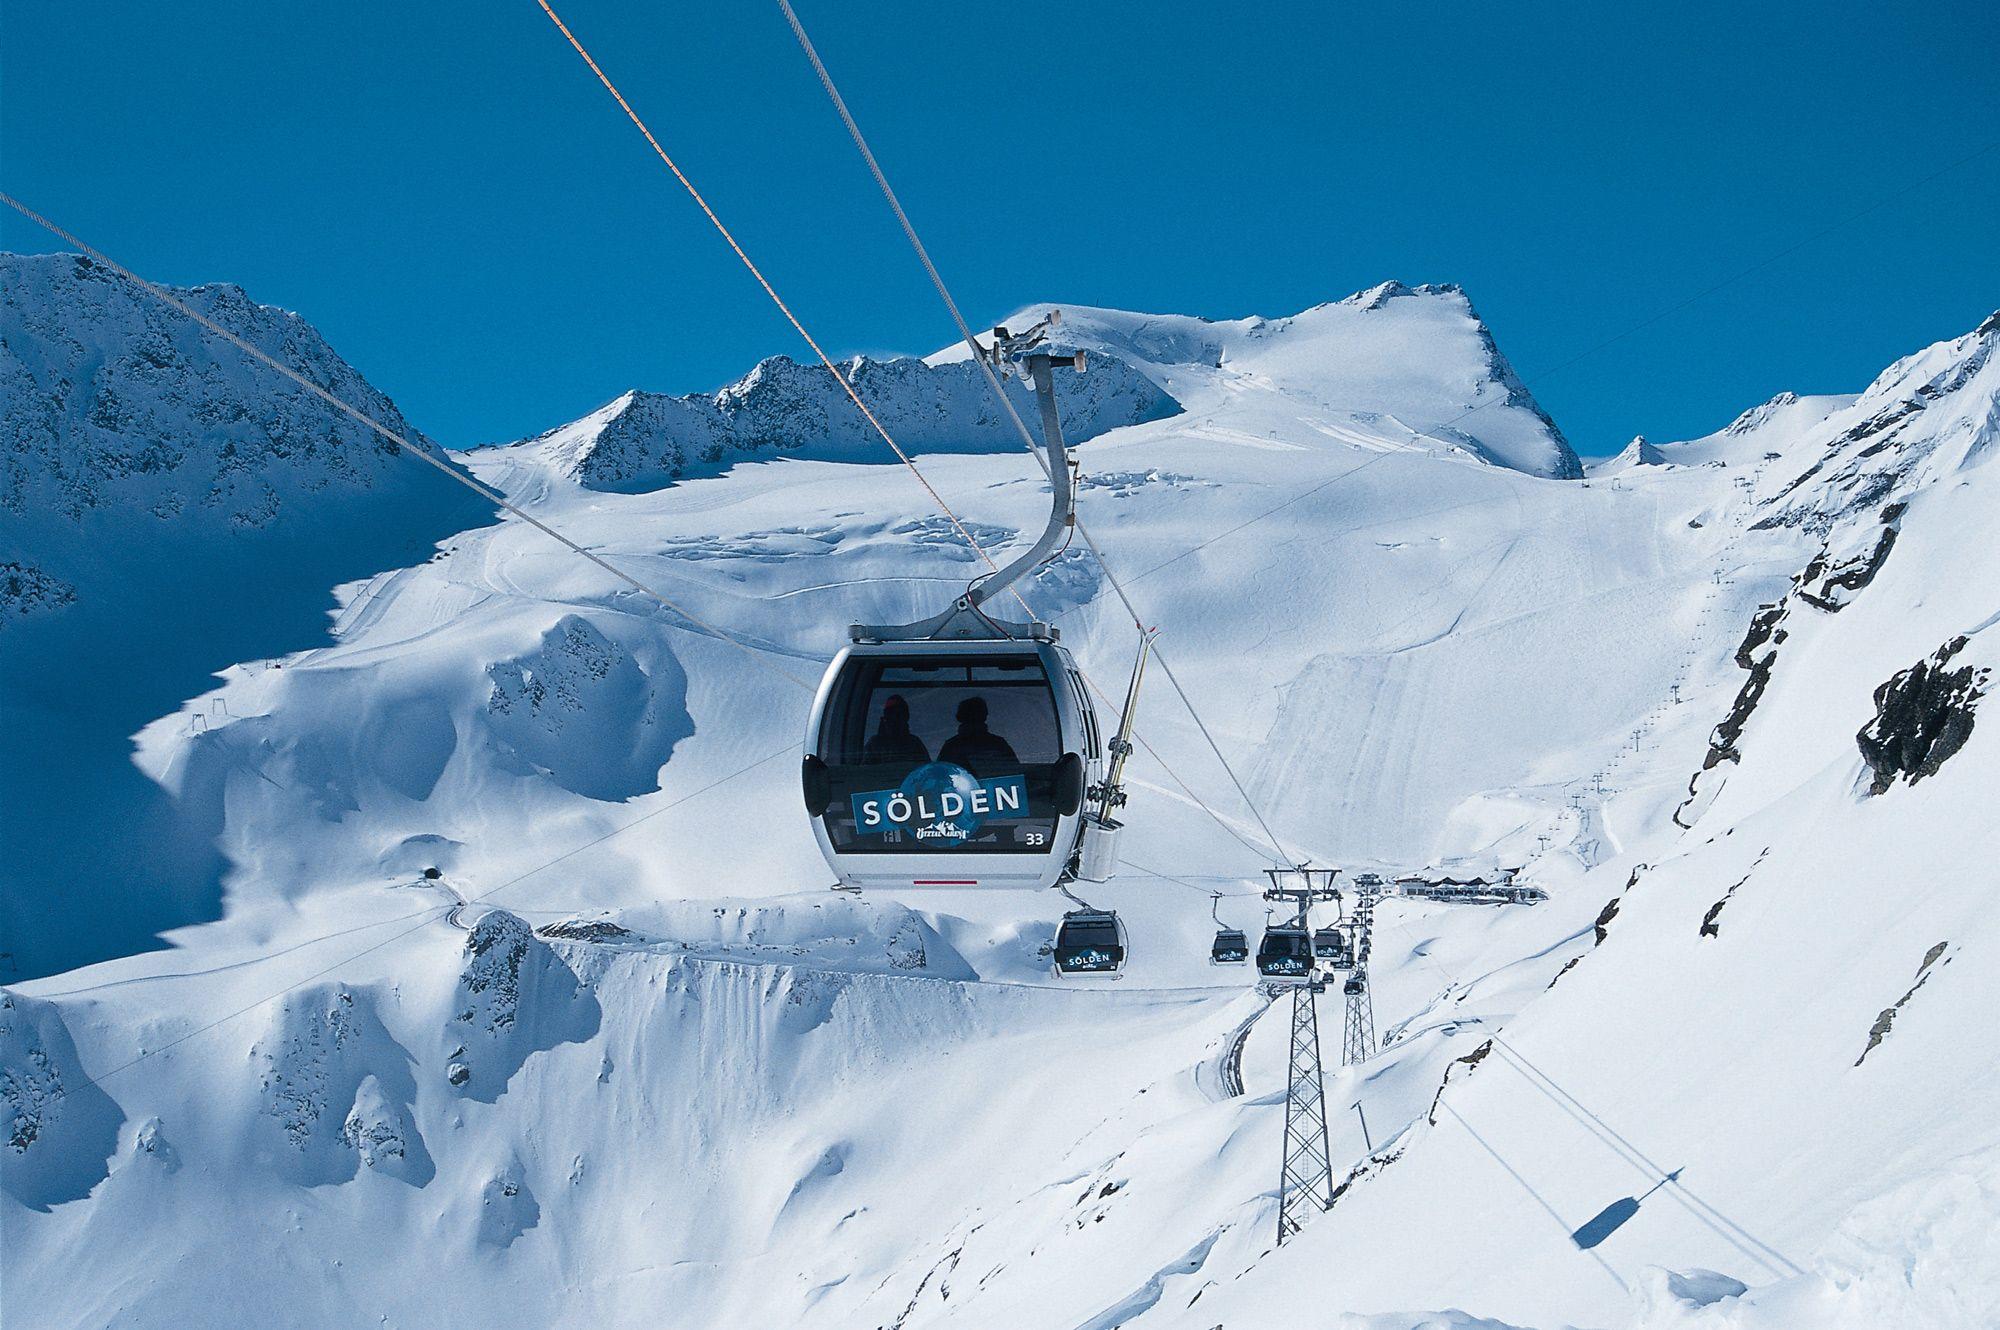 Solden Austria Ski Resort Ski holidays, Ski austria